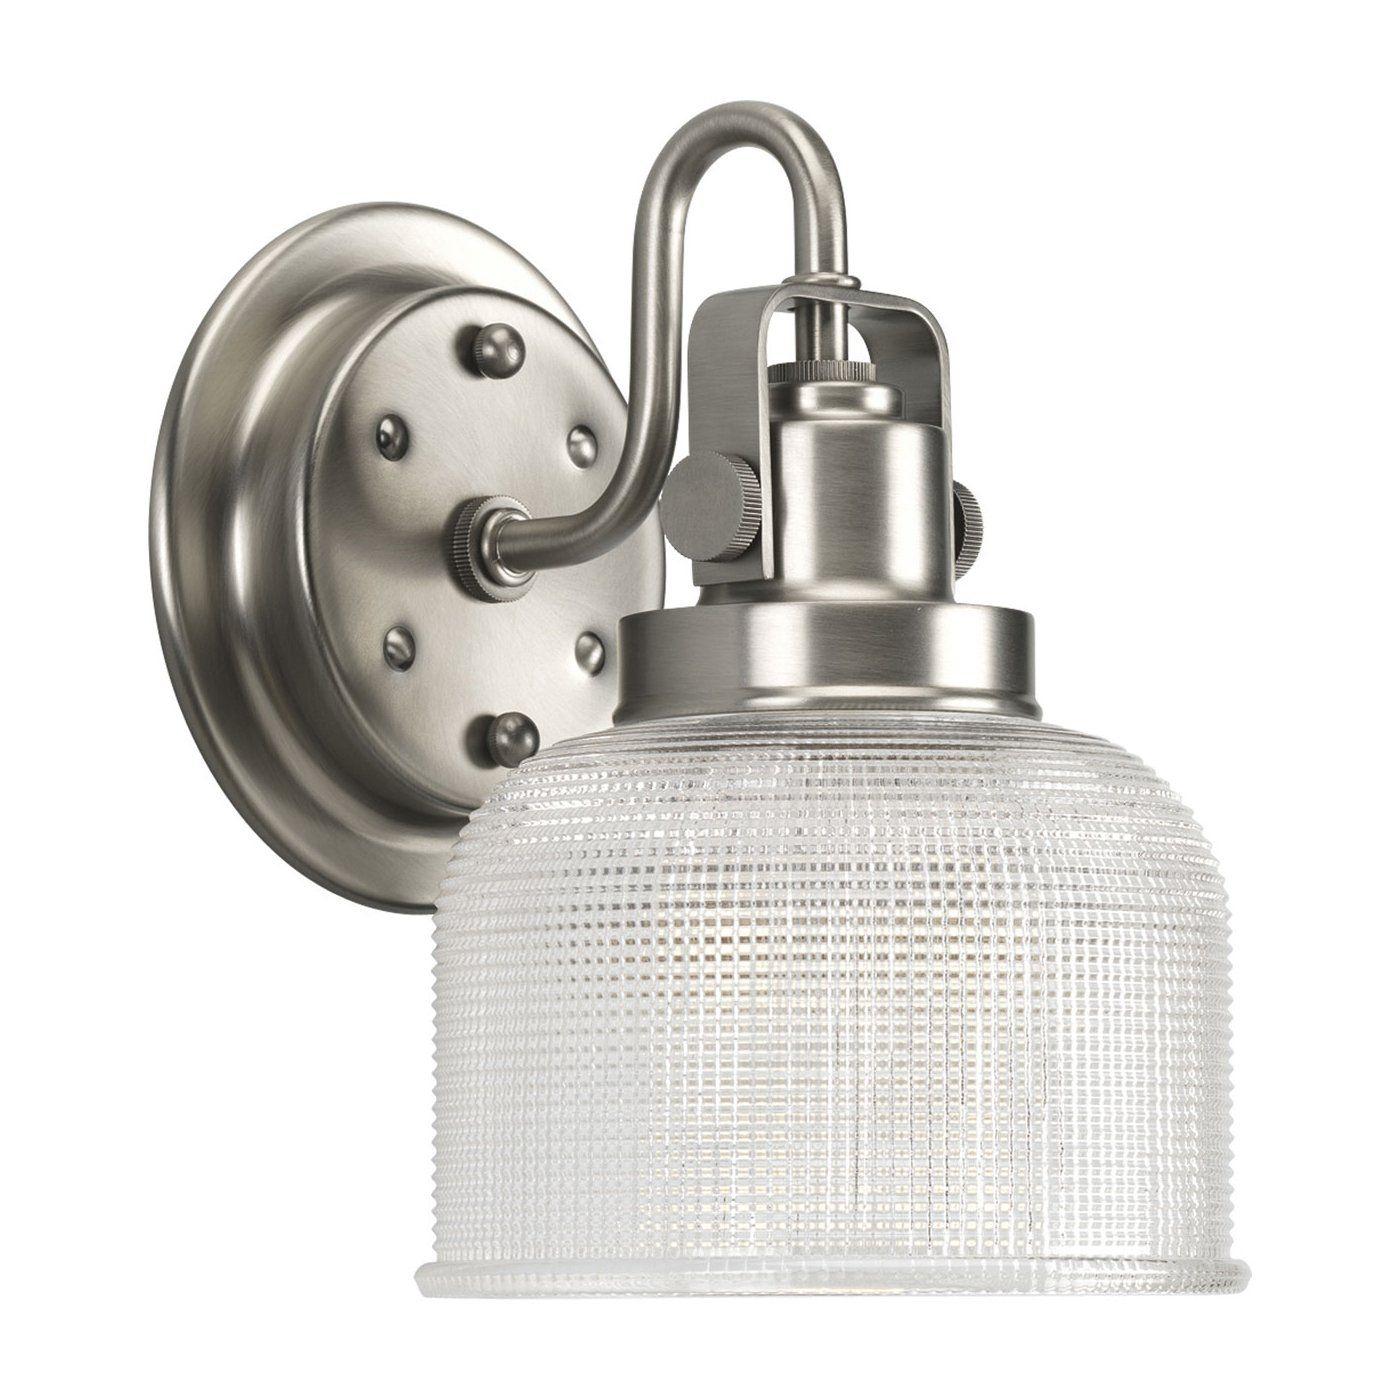 DAD'S BATHRM - Progress Lighting P2989 Archie Bathroom Light   ATG Stores (50)